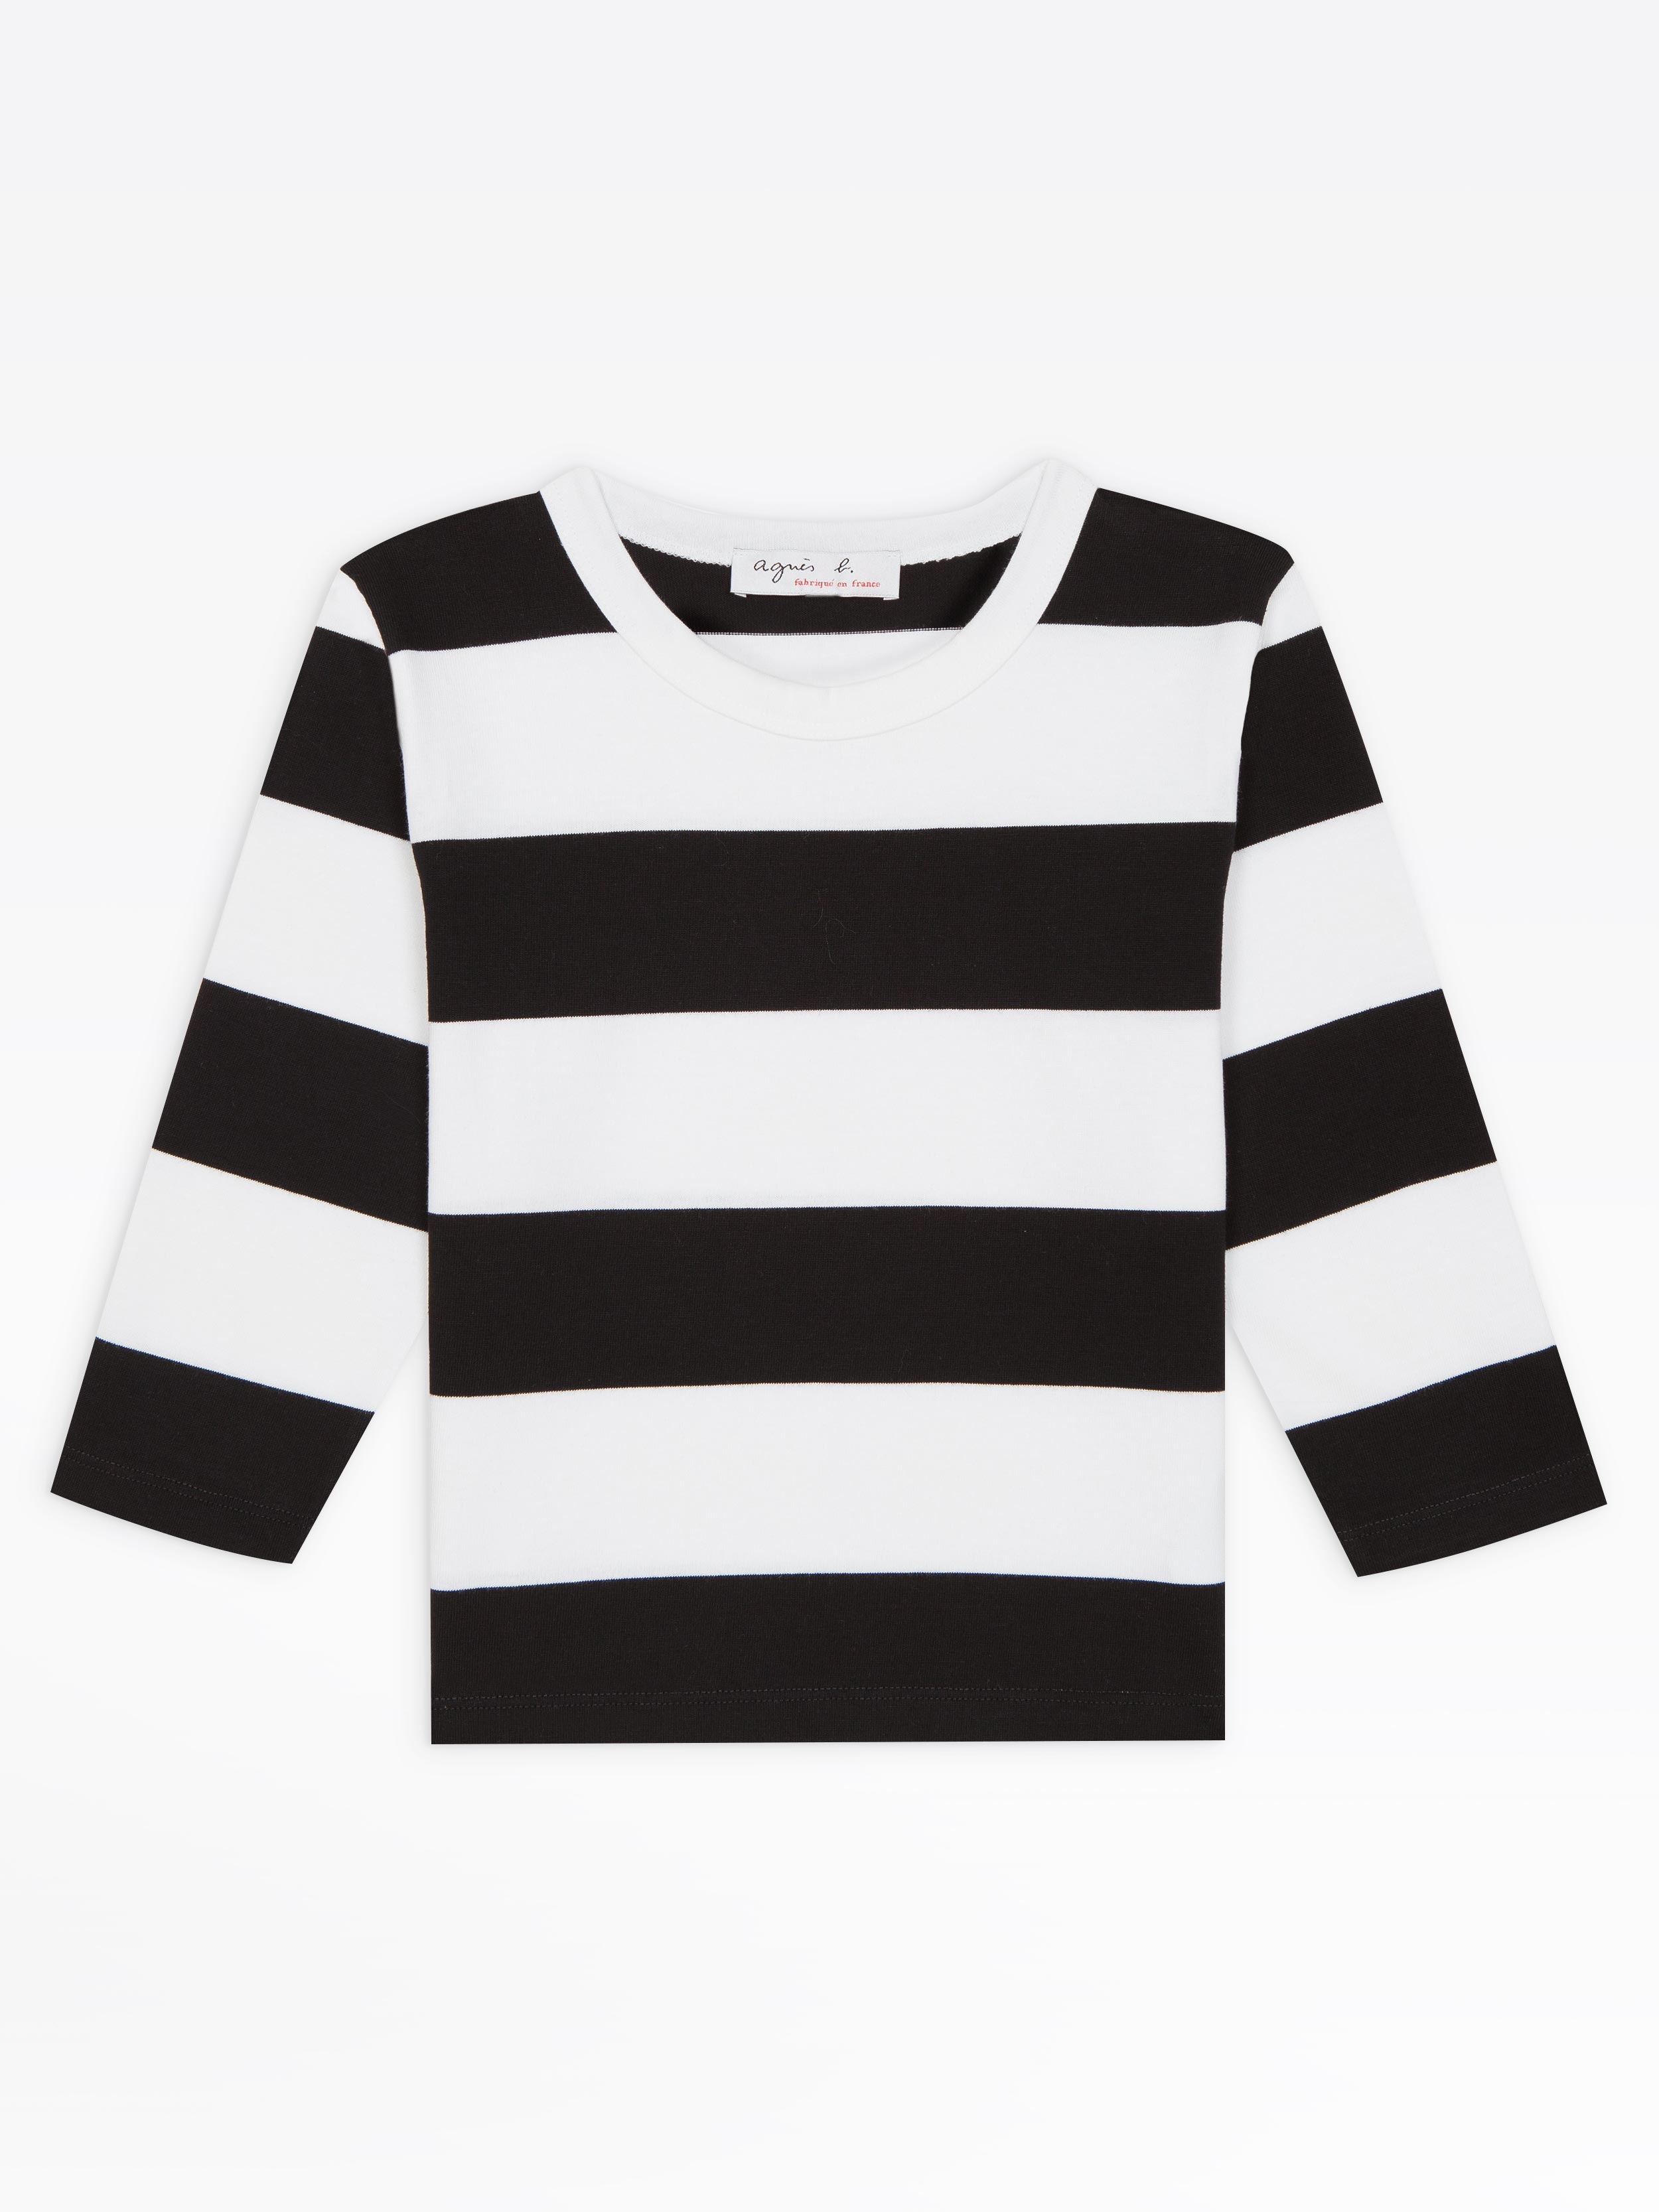 black t shirt with white stripes